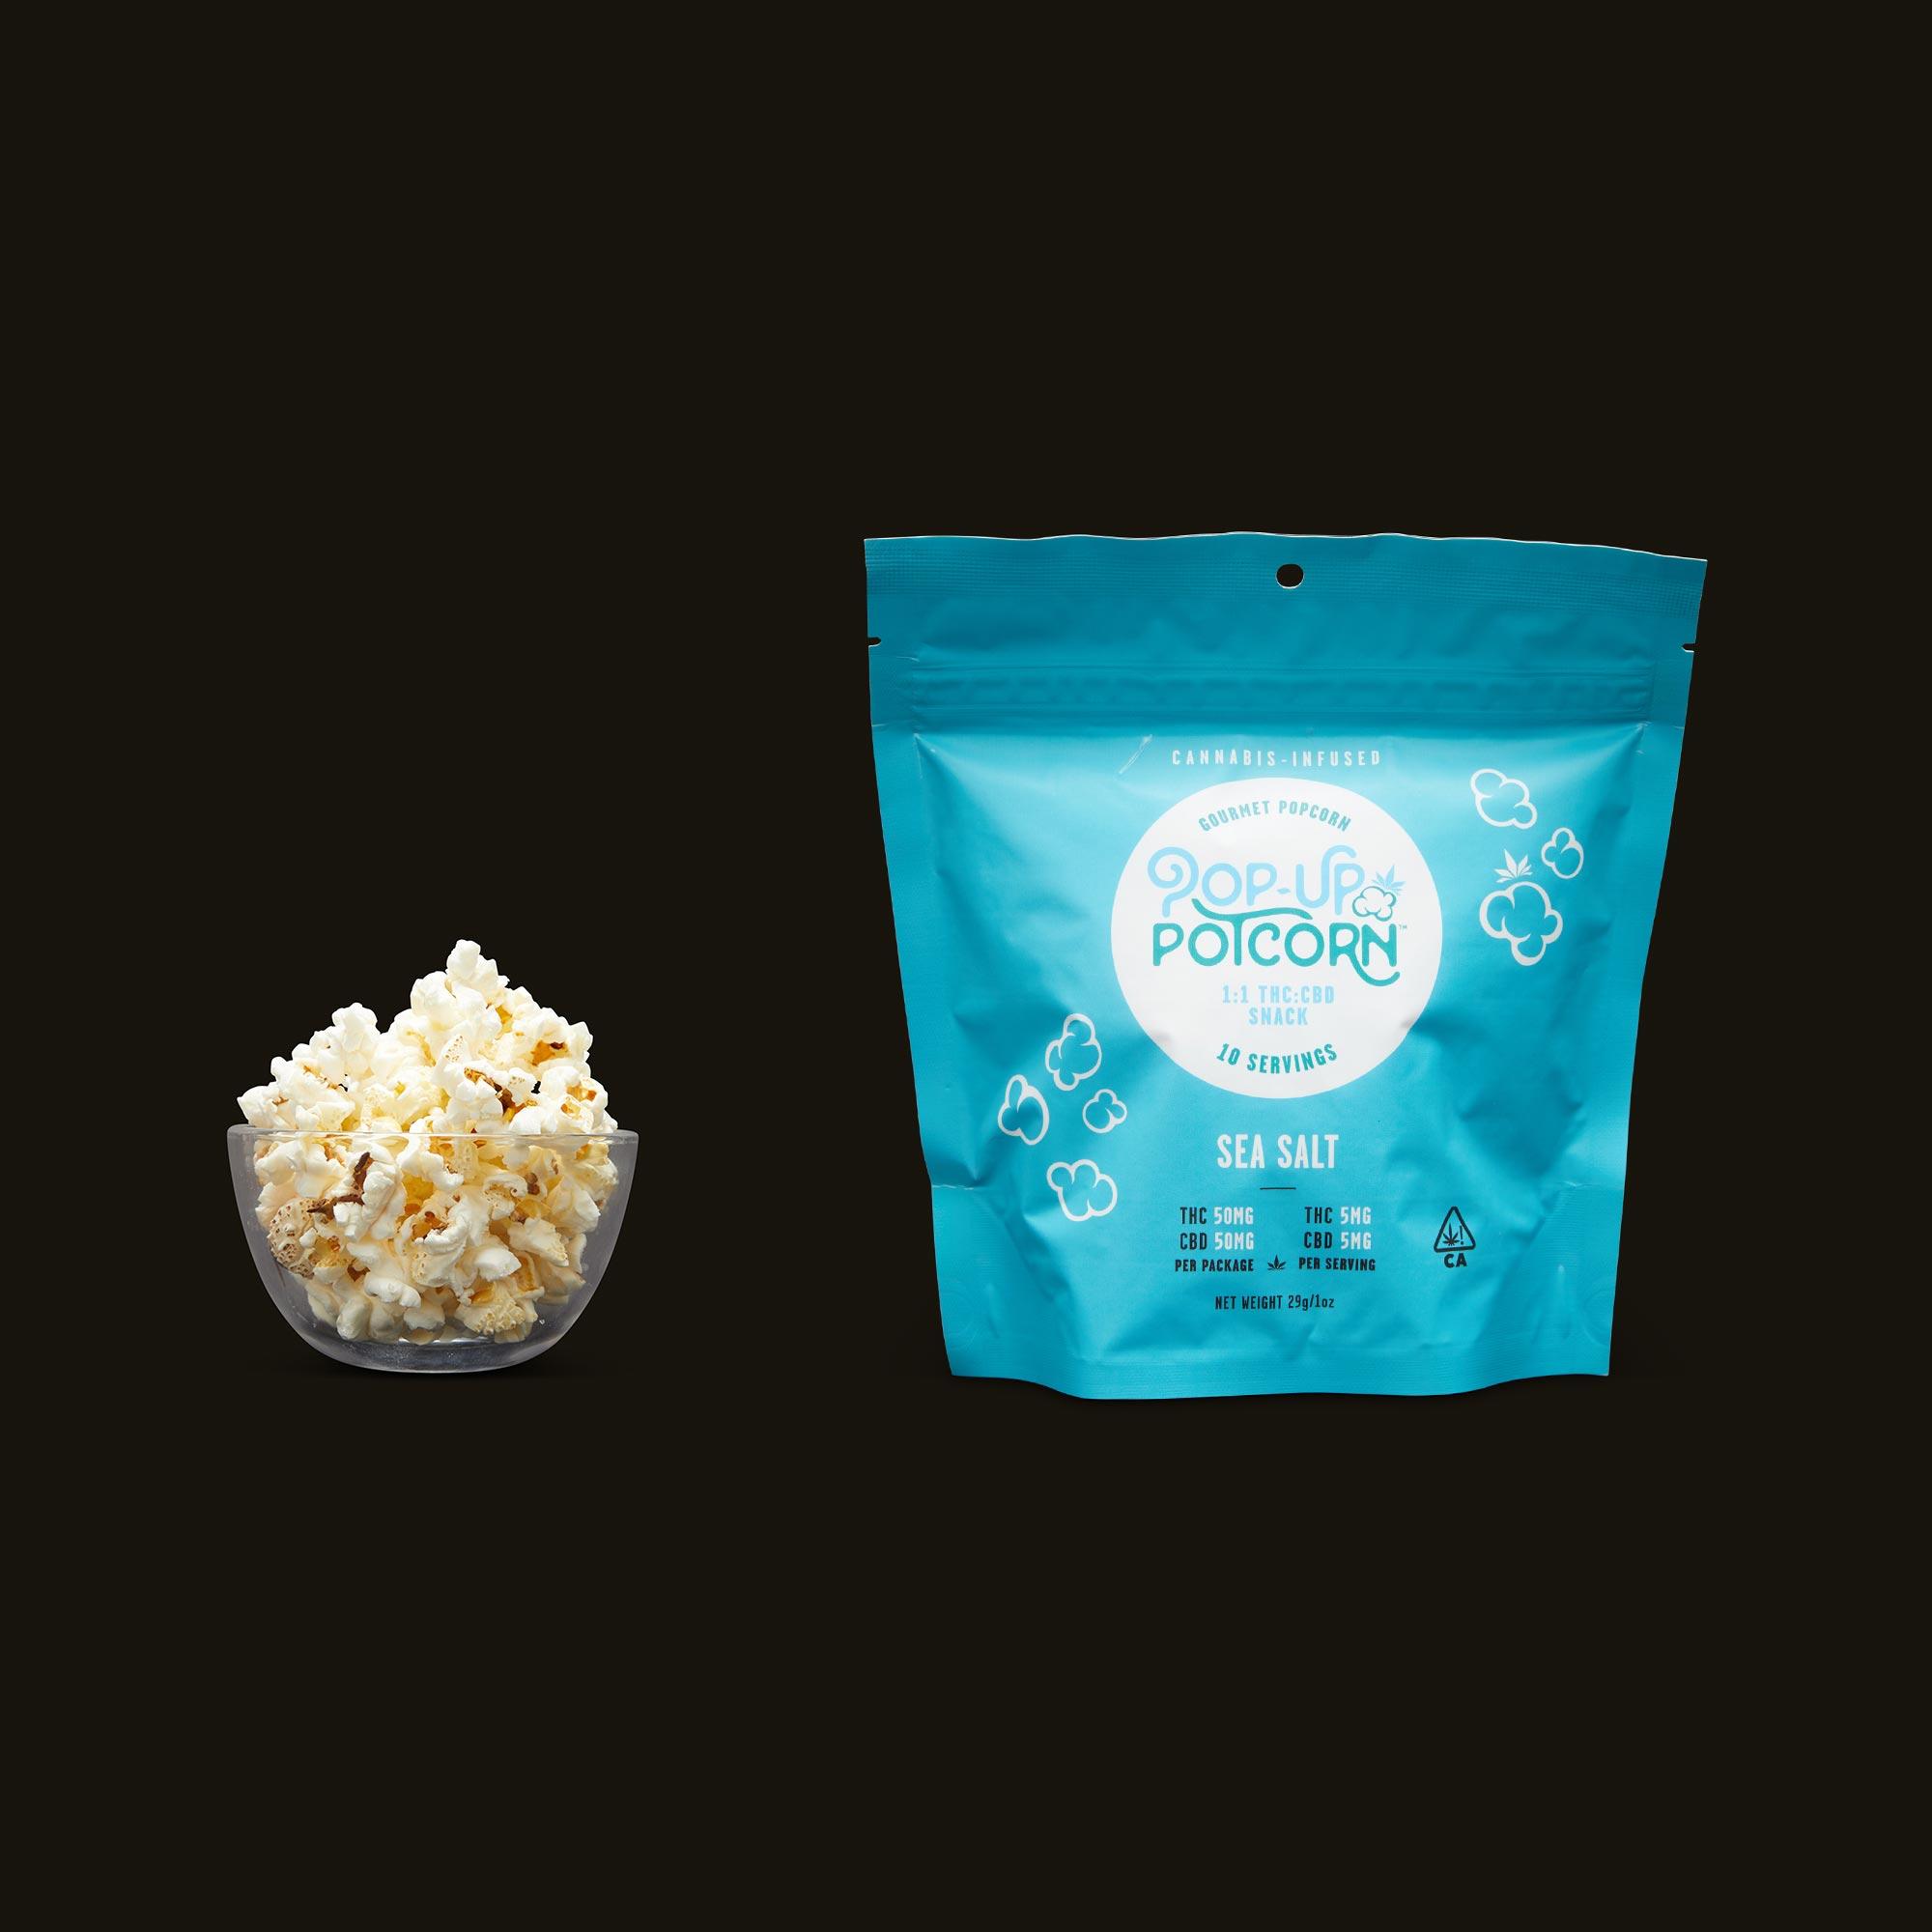 Pop-Up Potcorn Sea Salt Popcorn 1:1 - 10 Servings